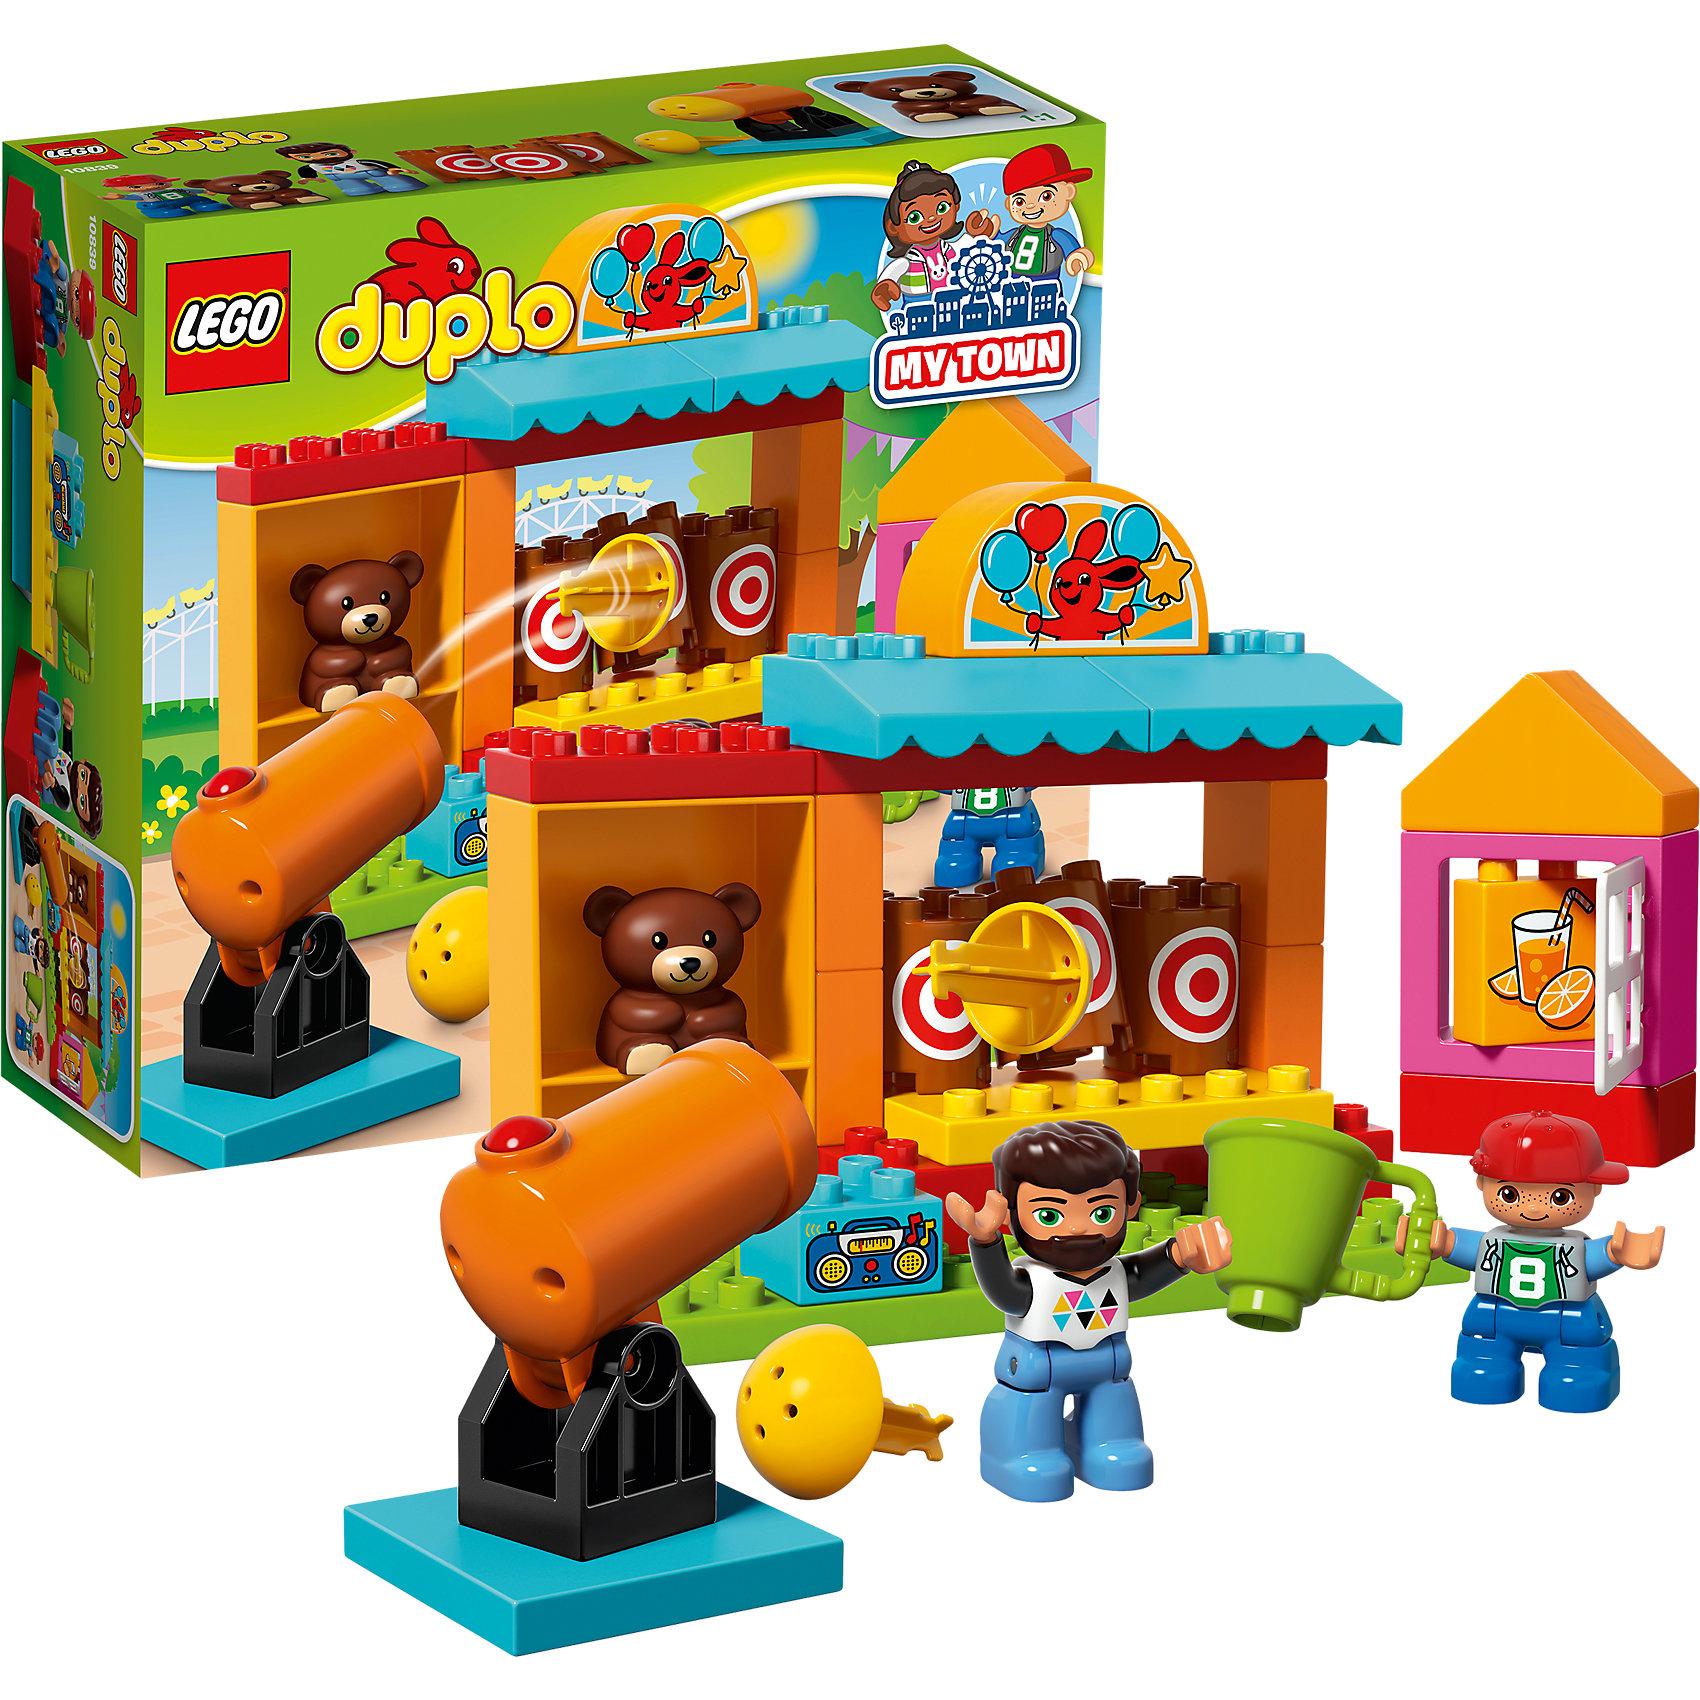 LEGO DUPLO 10839: ТирКонструкторы для малышей<br><br><br>Ширина мм: 282<br>Глубина мм: 262<br>Высота мм: 96<br>Вес г: 637<br>Возраст от месяцев: 24<br>Возраст до месяцев: 60<br>Пол: Мужской<br>Возраст: Детский<br>SKU: 5620073